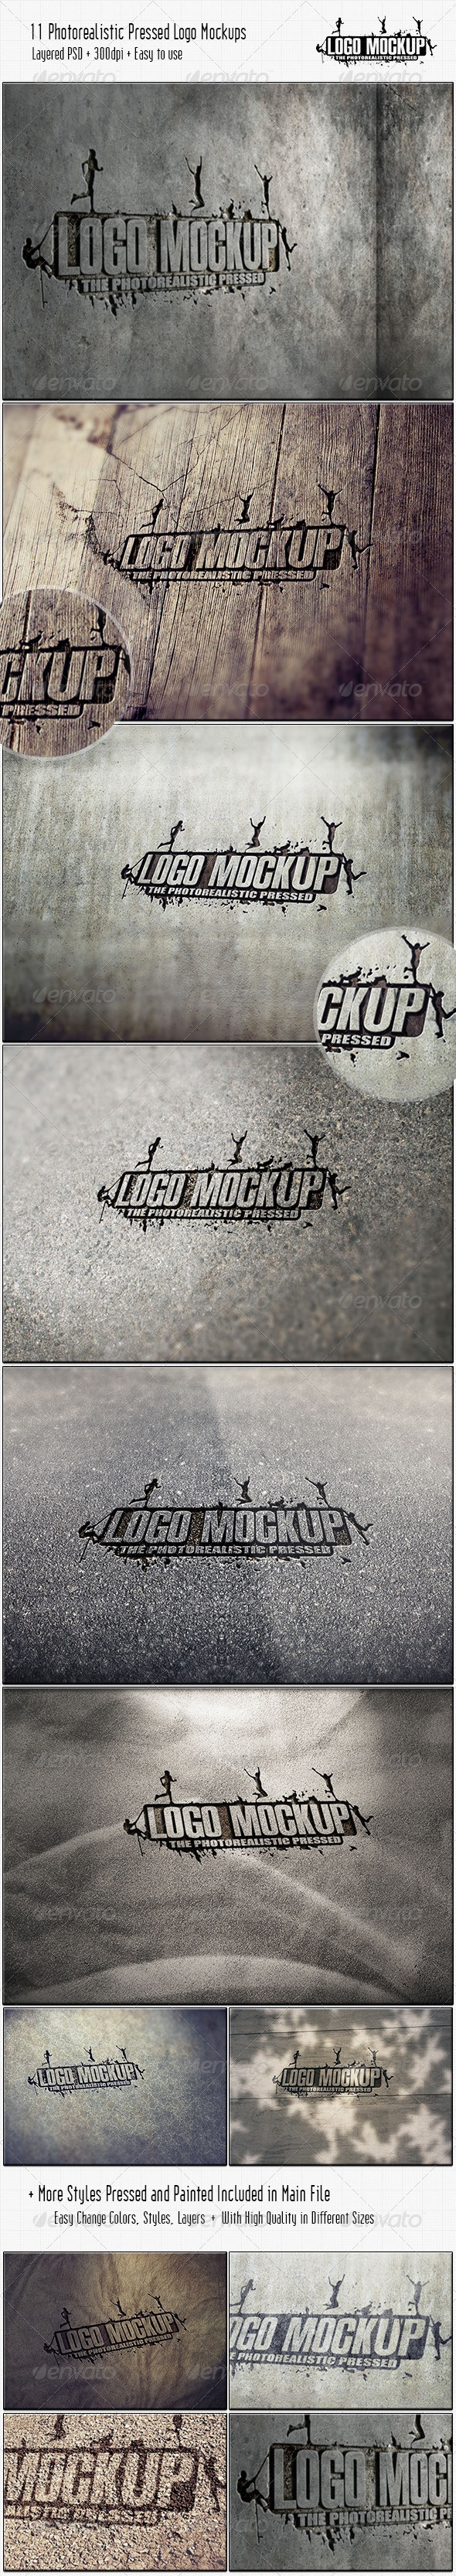 Download PSD: http://graphicriver.net/item/11-photorealistic-pressed-logo-mockups/3709656?ref=behzadg